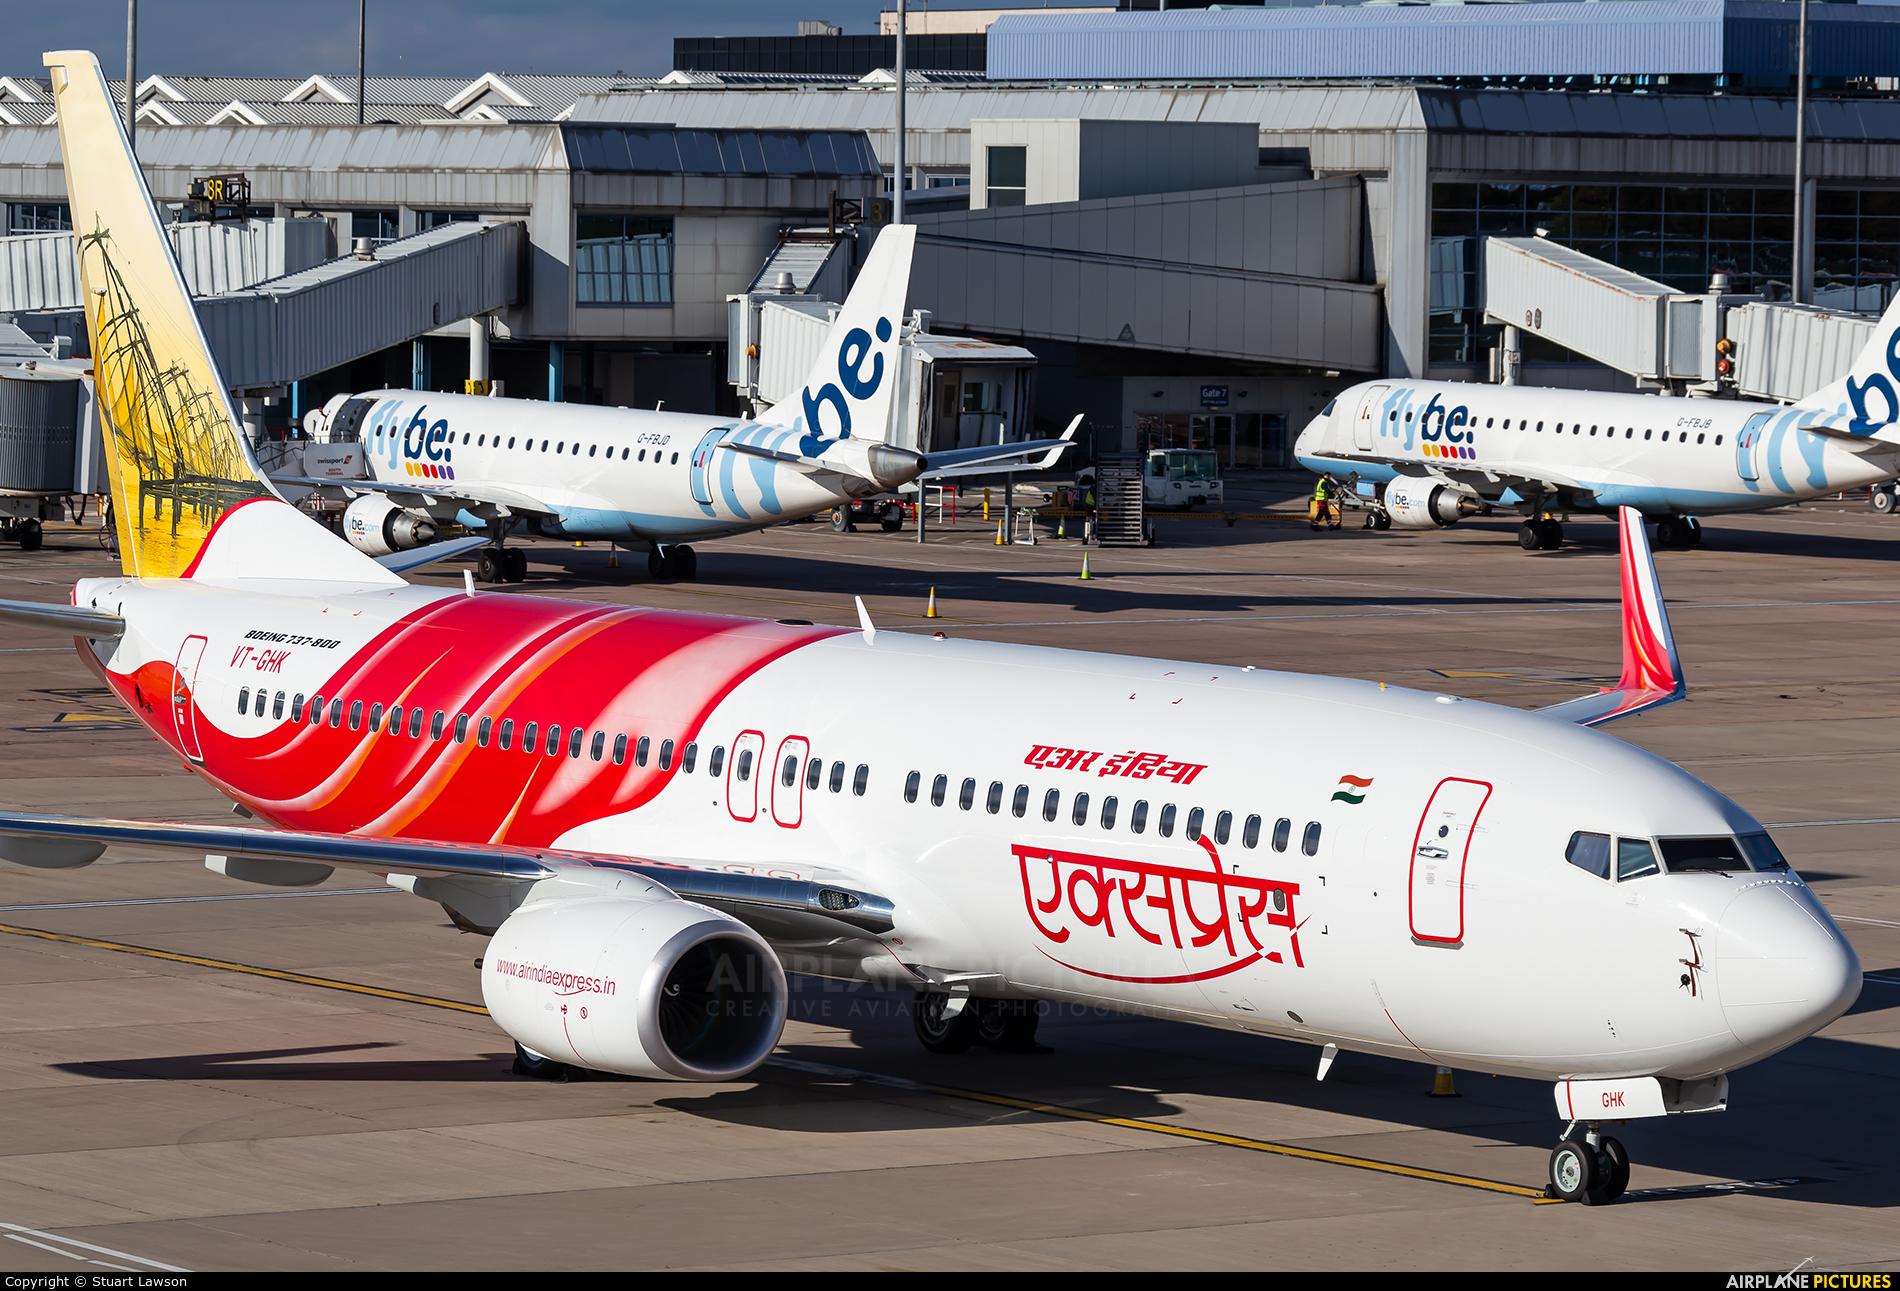 Air India Express VT-GHK aircraft at Birmingham